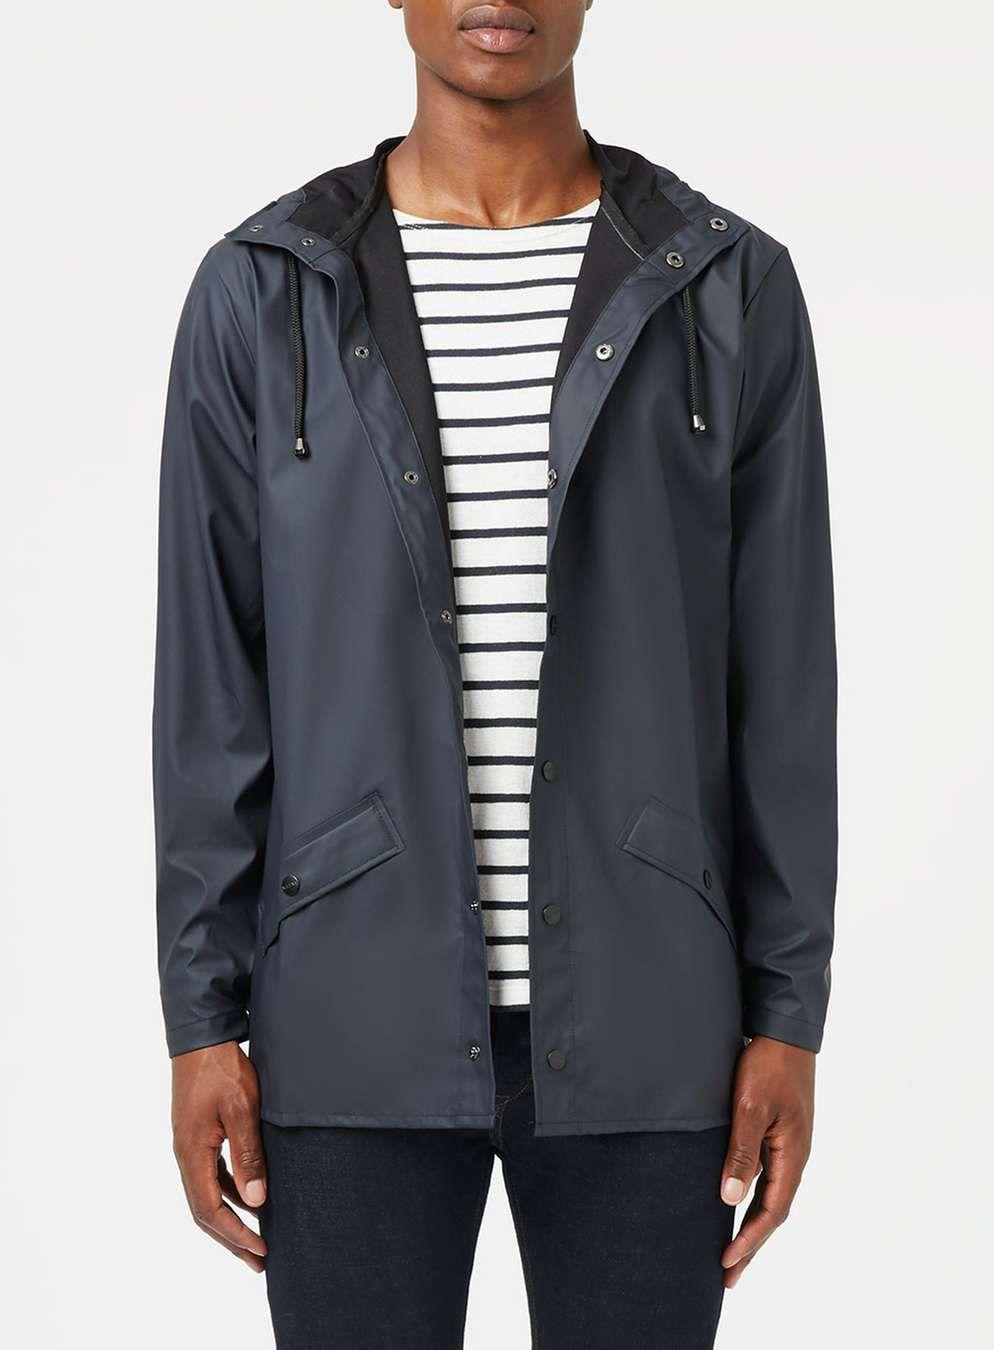 RAINS Navy Rain Jacket - Men's Coats & Jackets - Clothing - TOPMAN